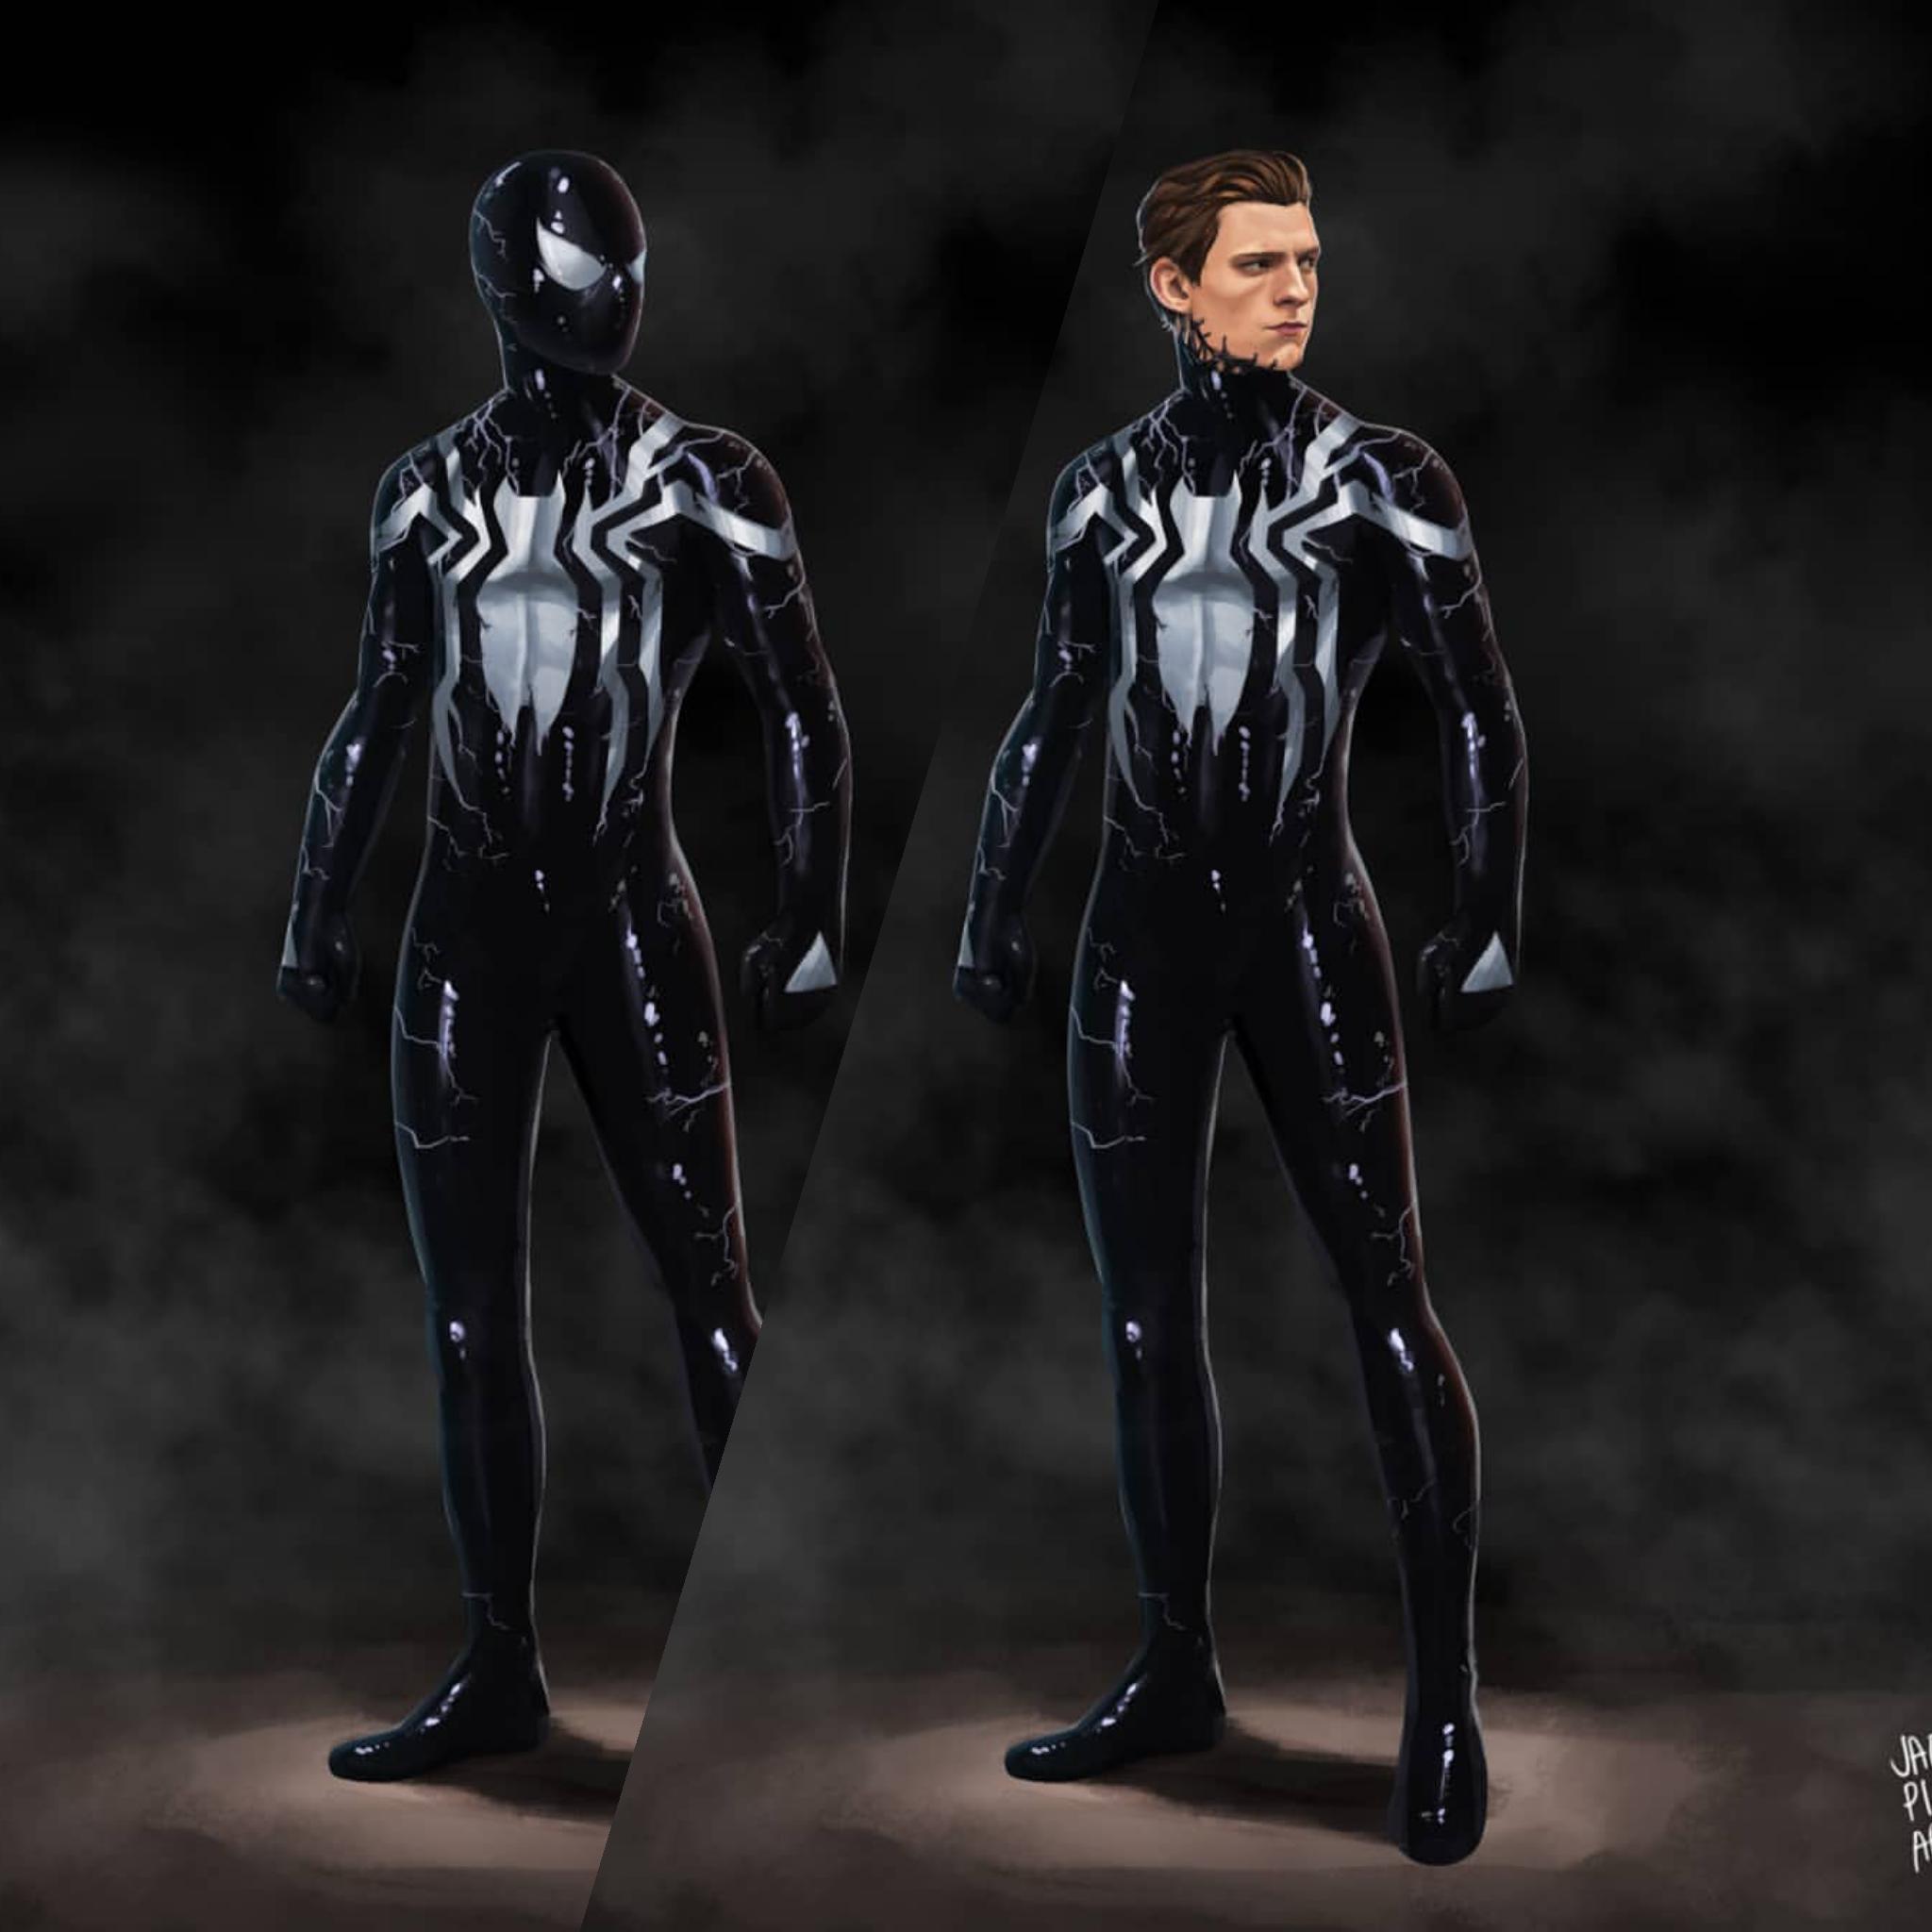 Ex Mcu Symbiote Spiderman Symbiote Spiderman Spiderman Comic Black Spiderman